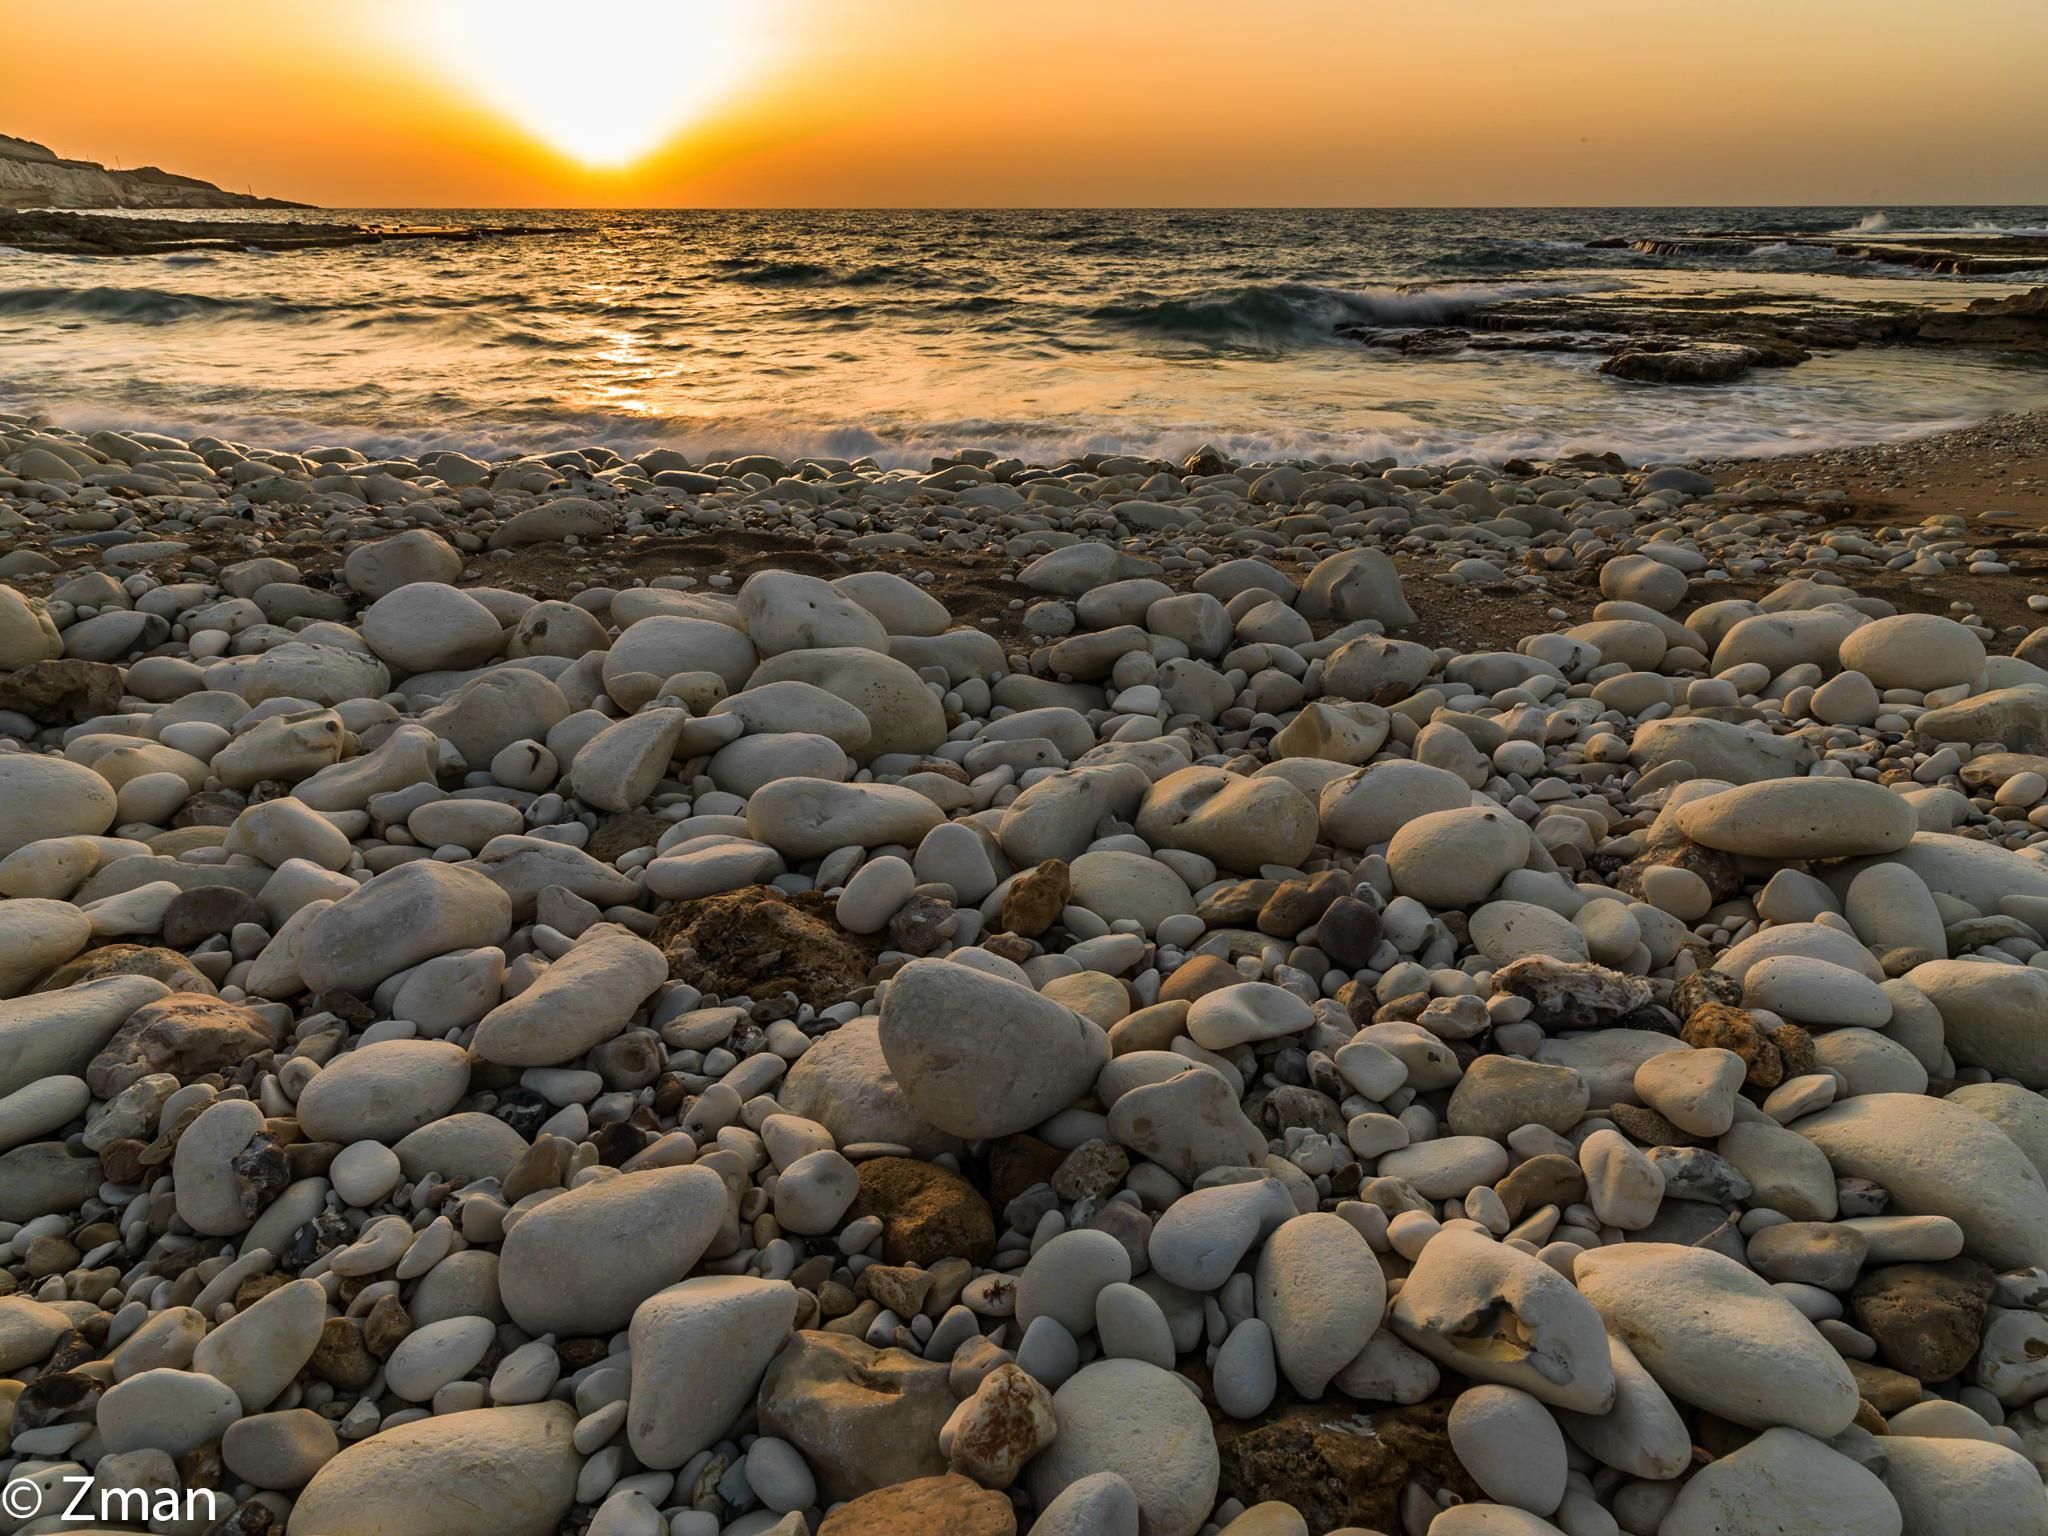 The Pebble Beach At Al Naqoura 03 by muhammad.nasser.963